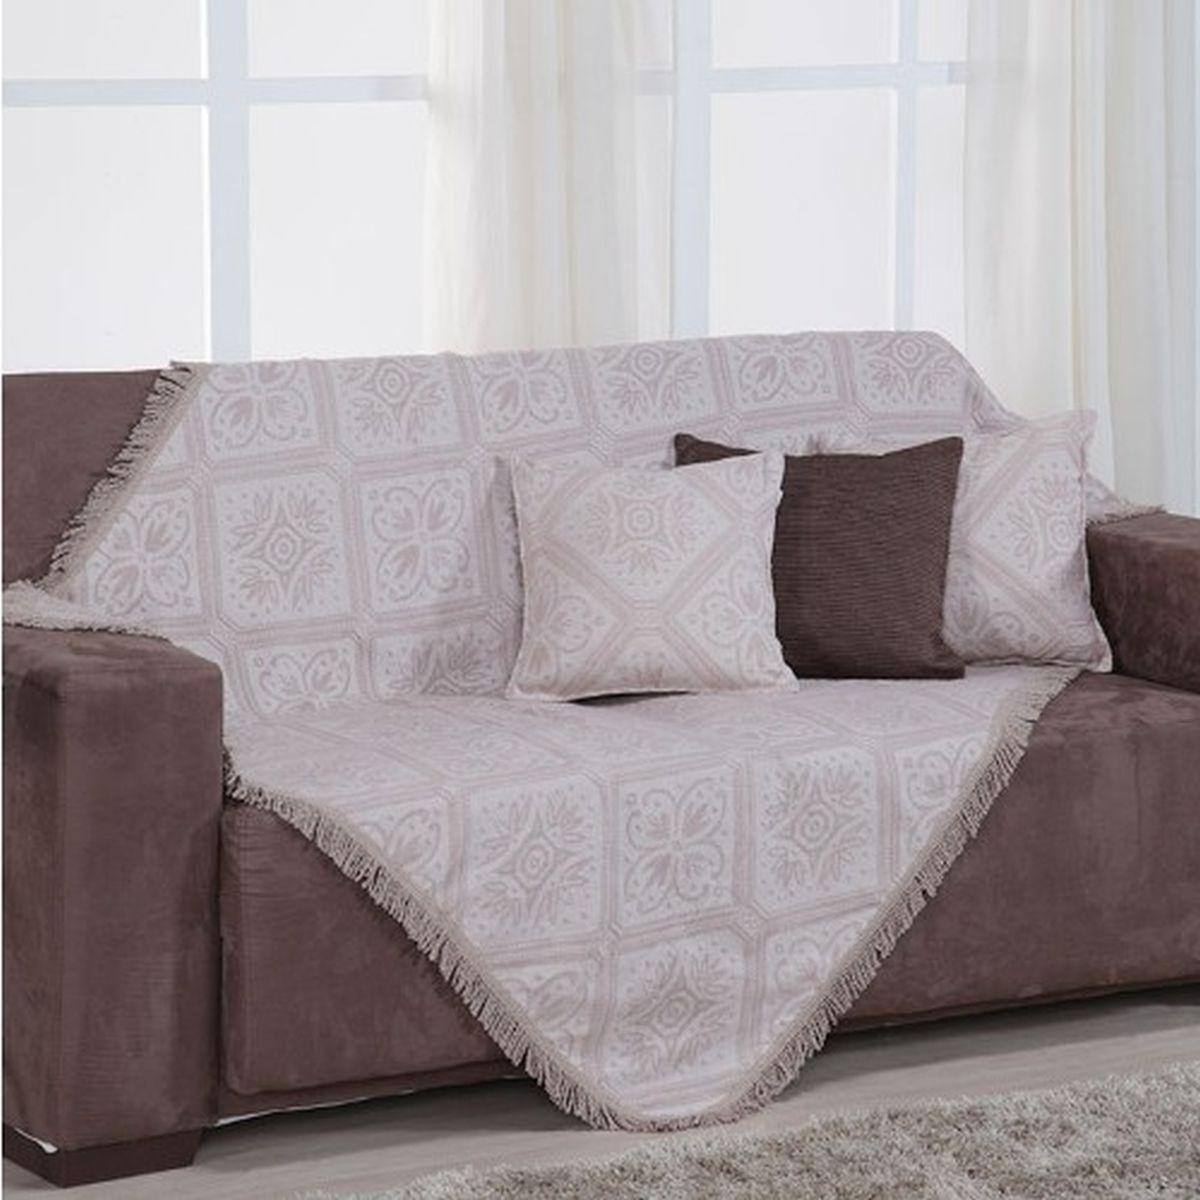 Mantas De sofa Dddy Manta Para sofà Porto 130x200cm Bege Fastlar